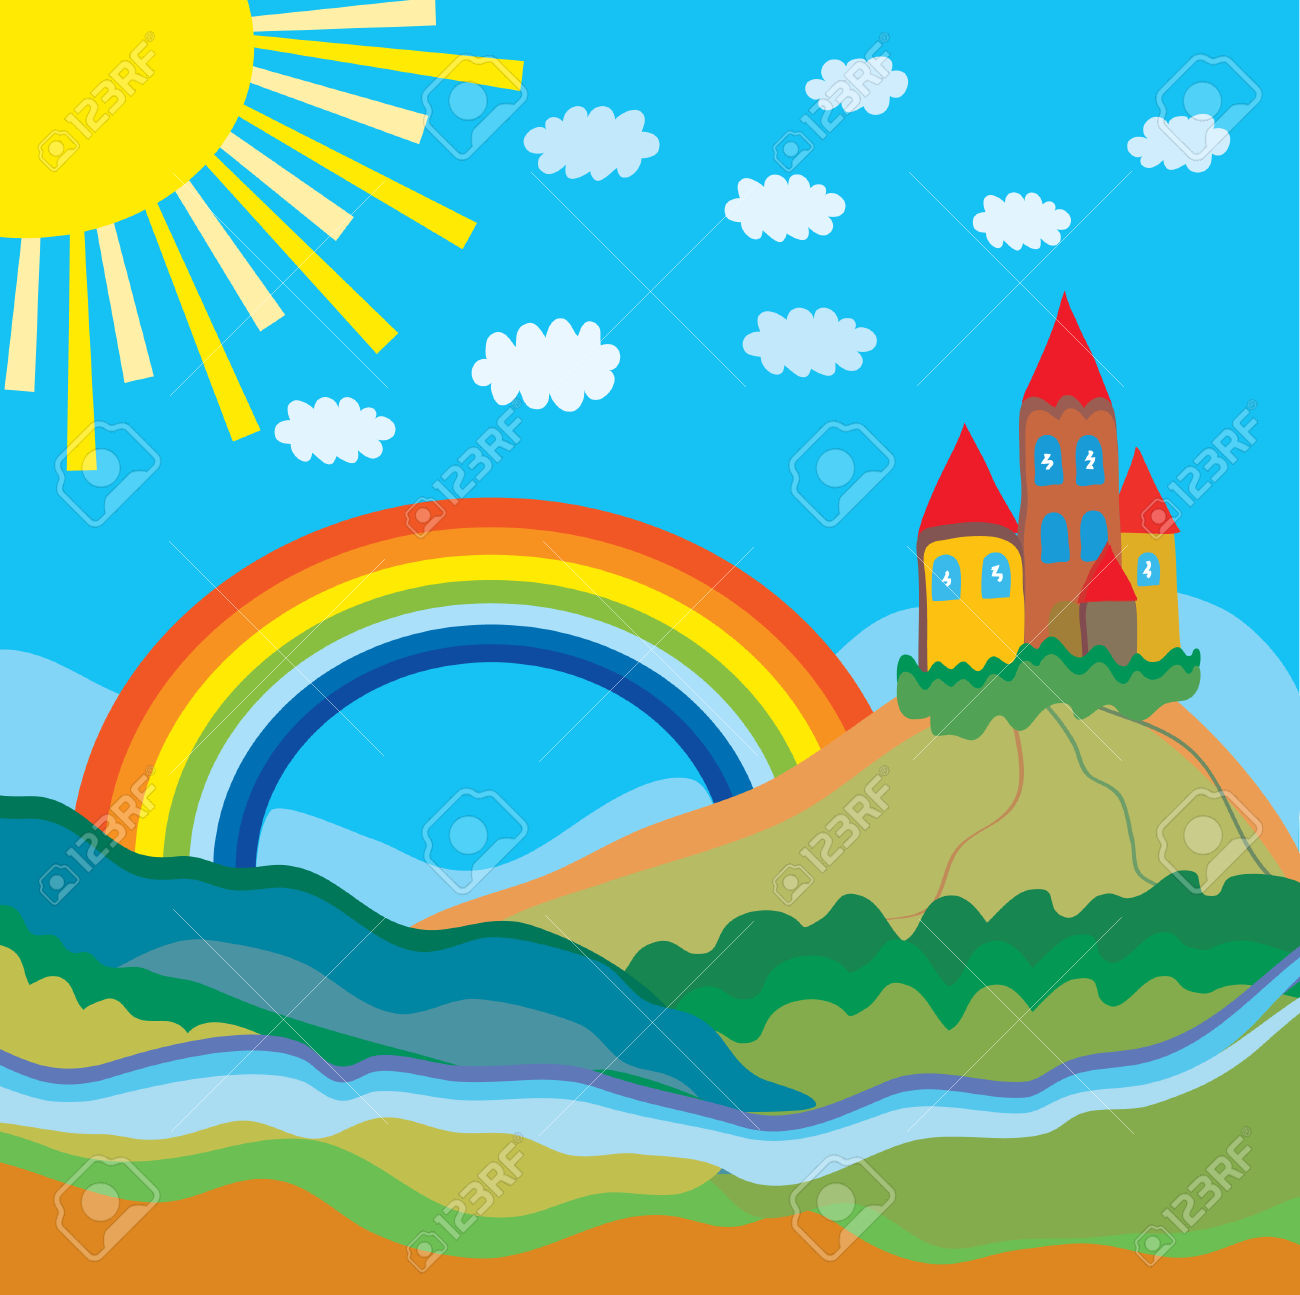 1300x1295 Rainbow Scenery Clipart Amp Rainbow Scenery Clip Art Images